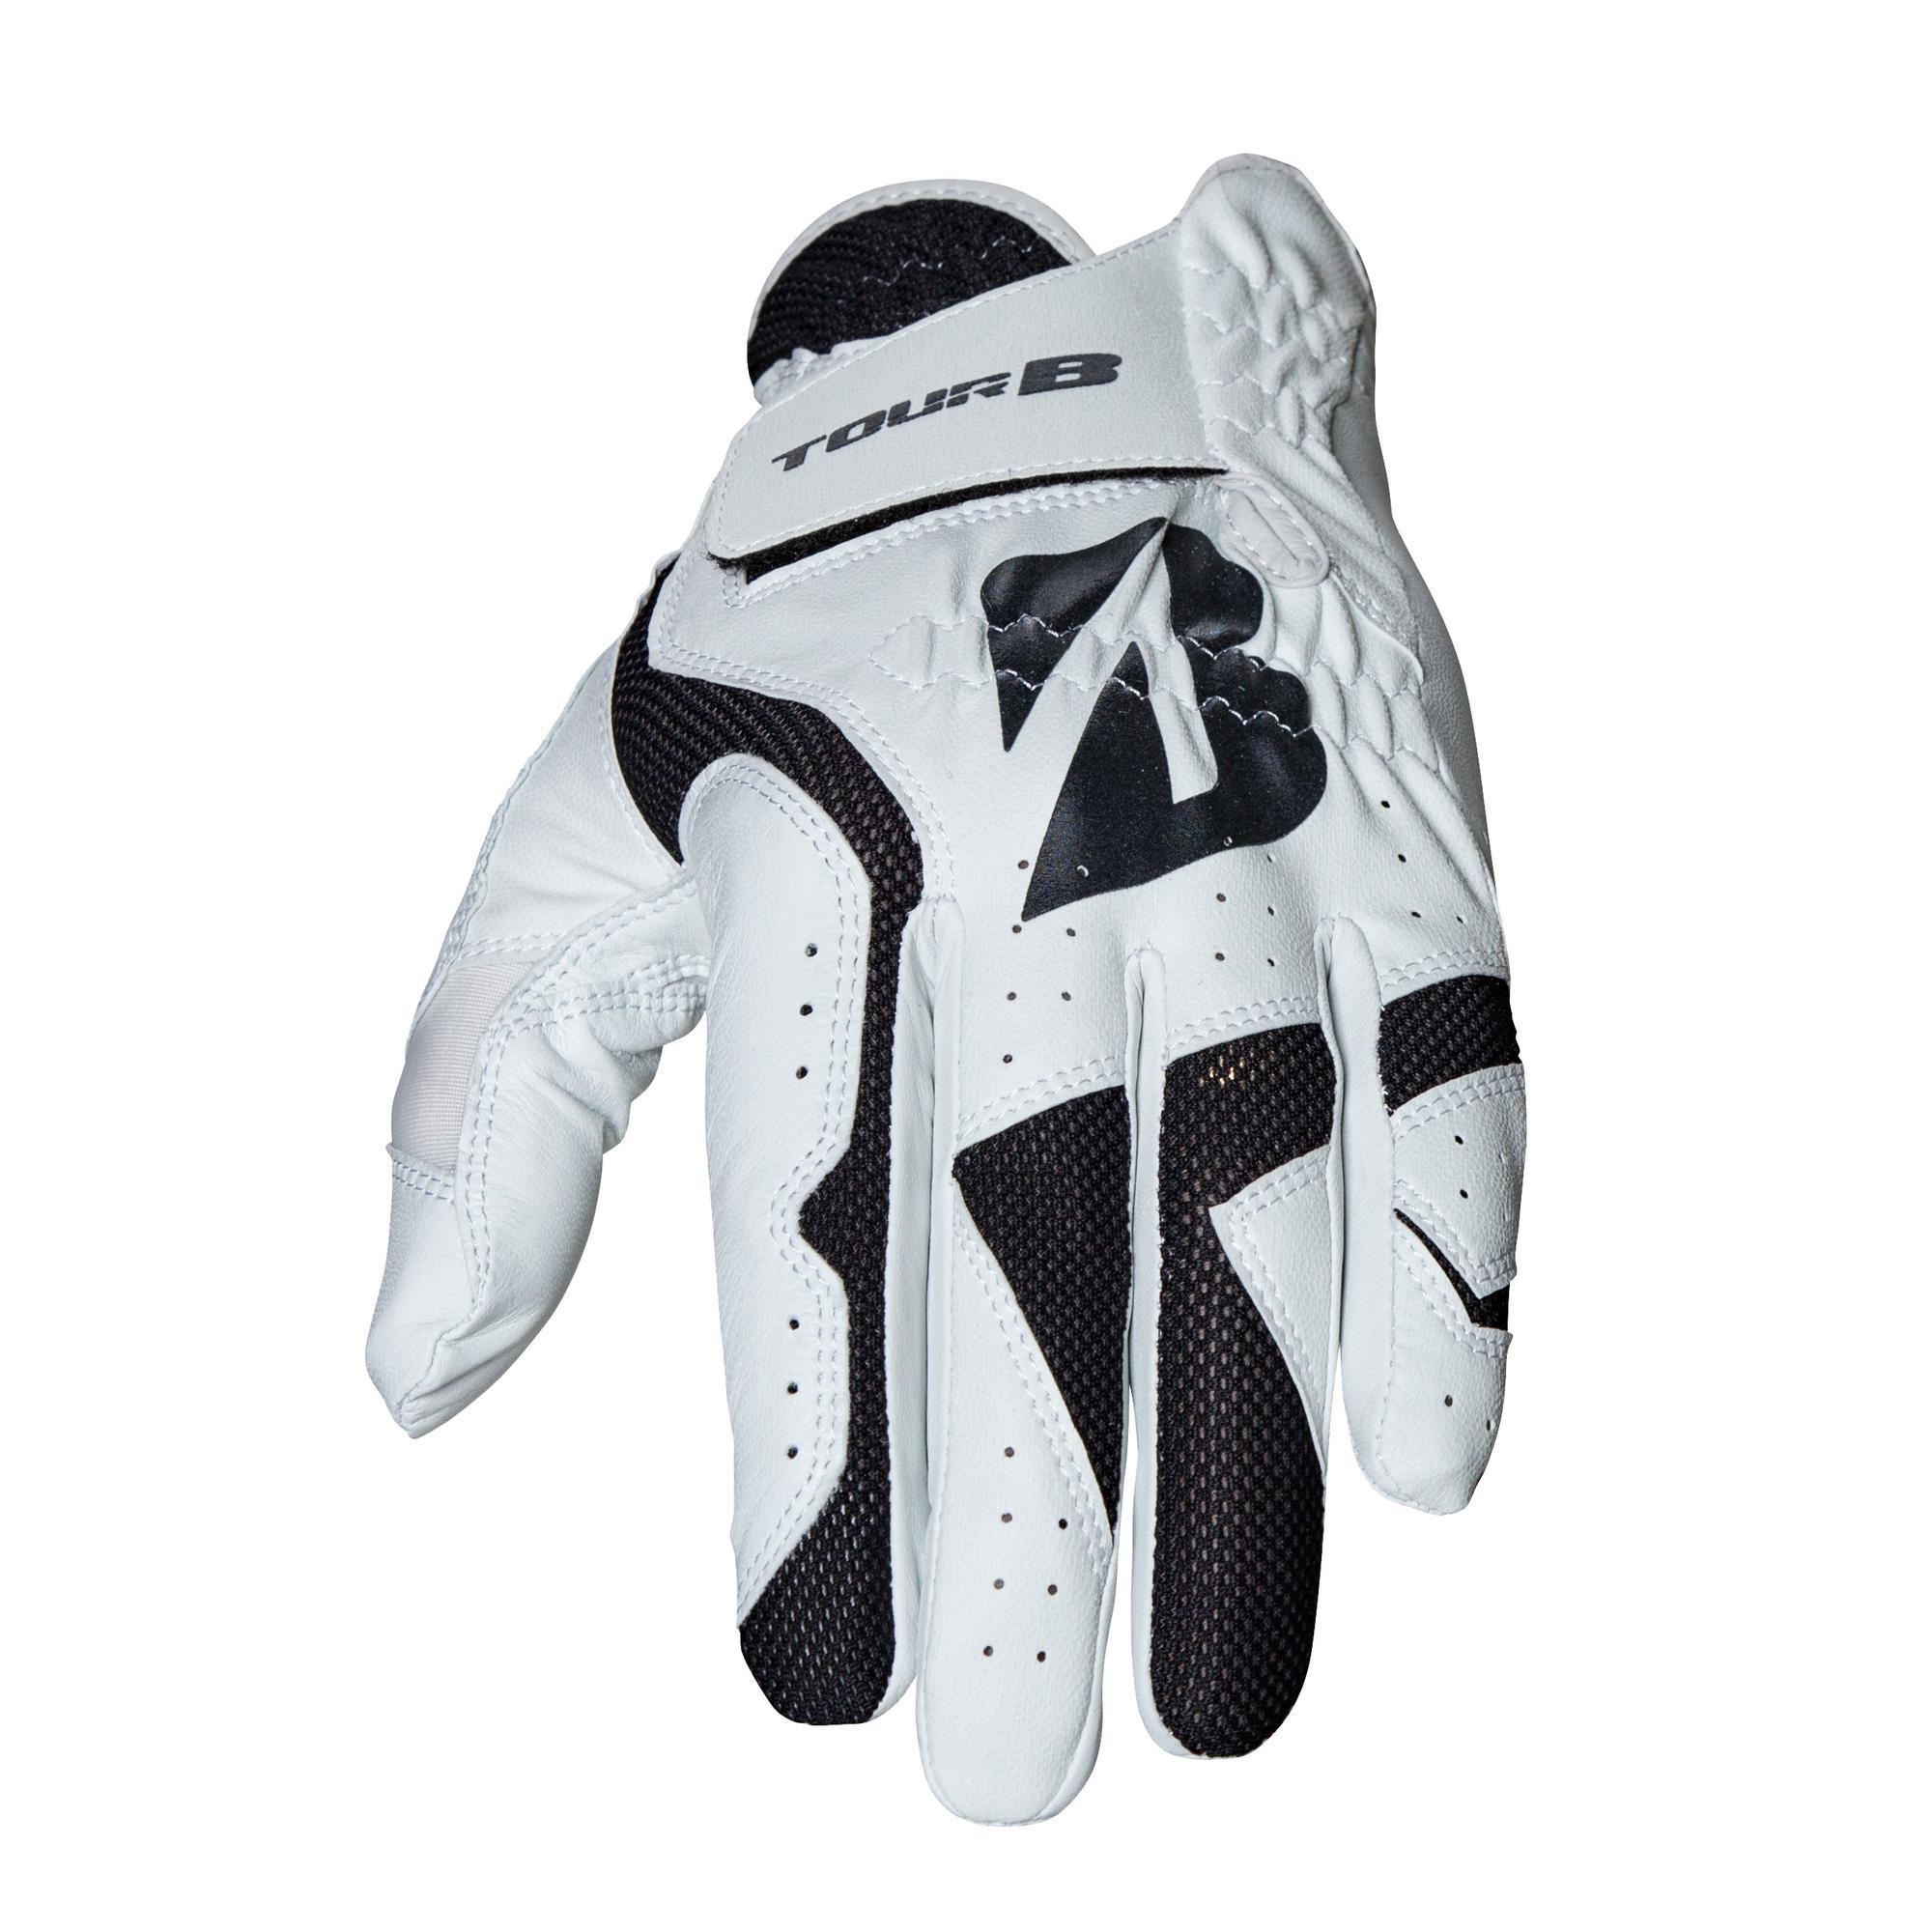 Tour B Fit Glove